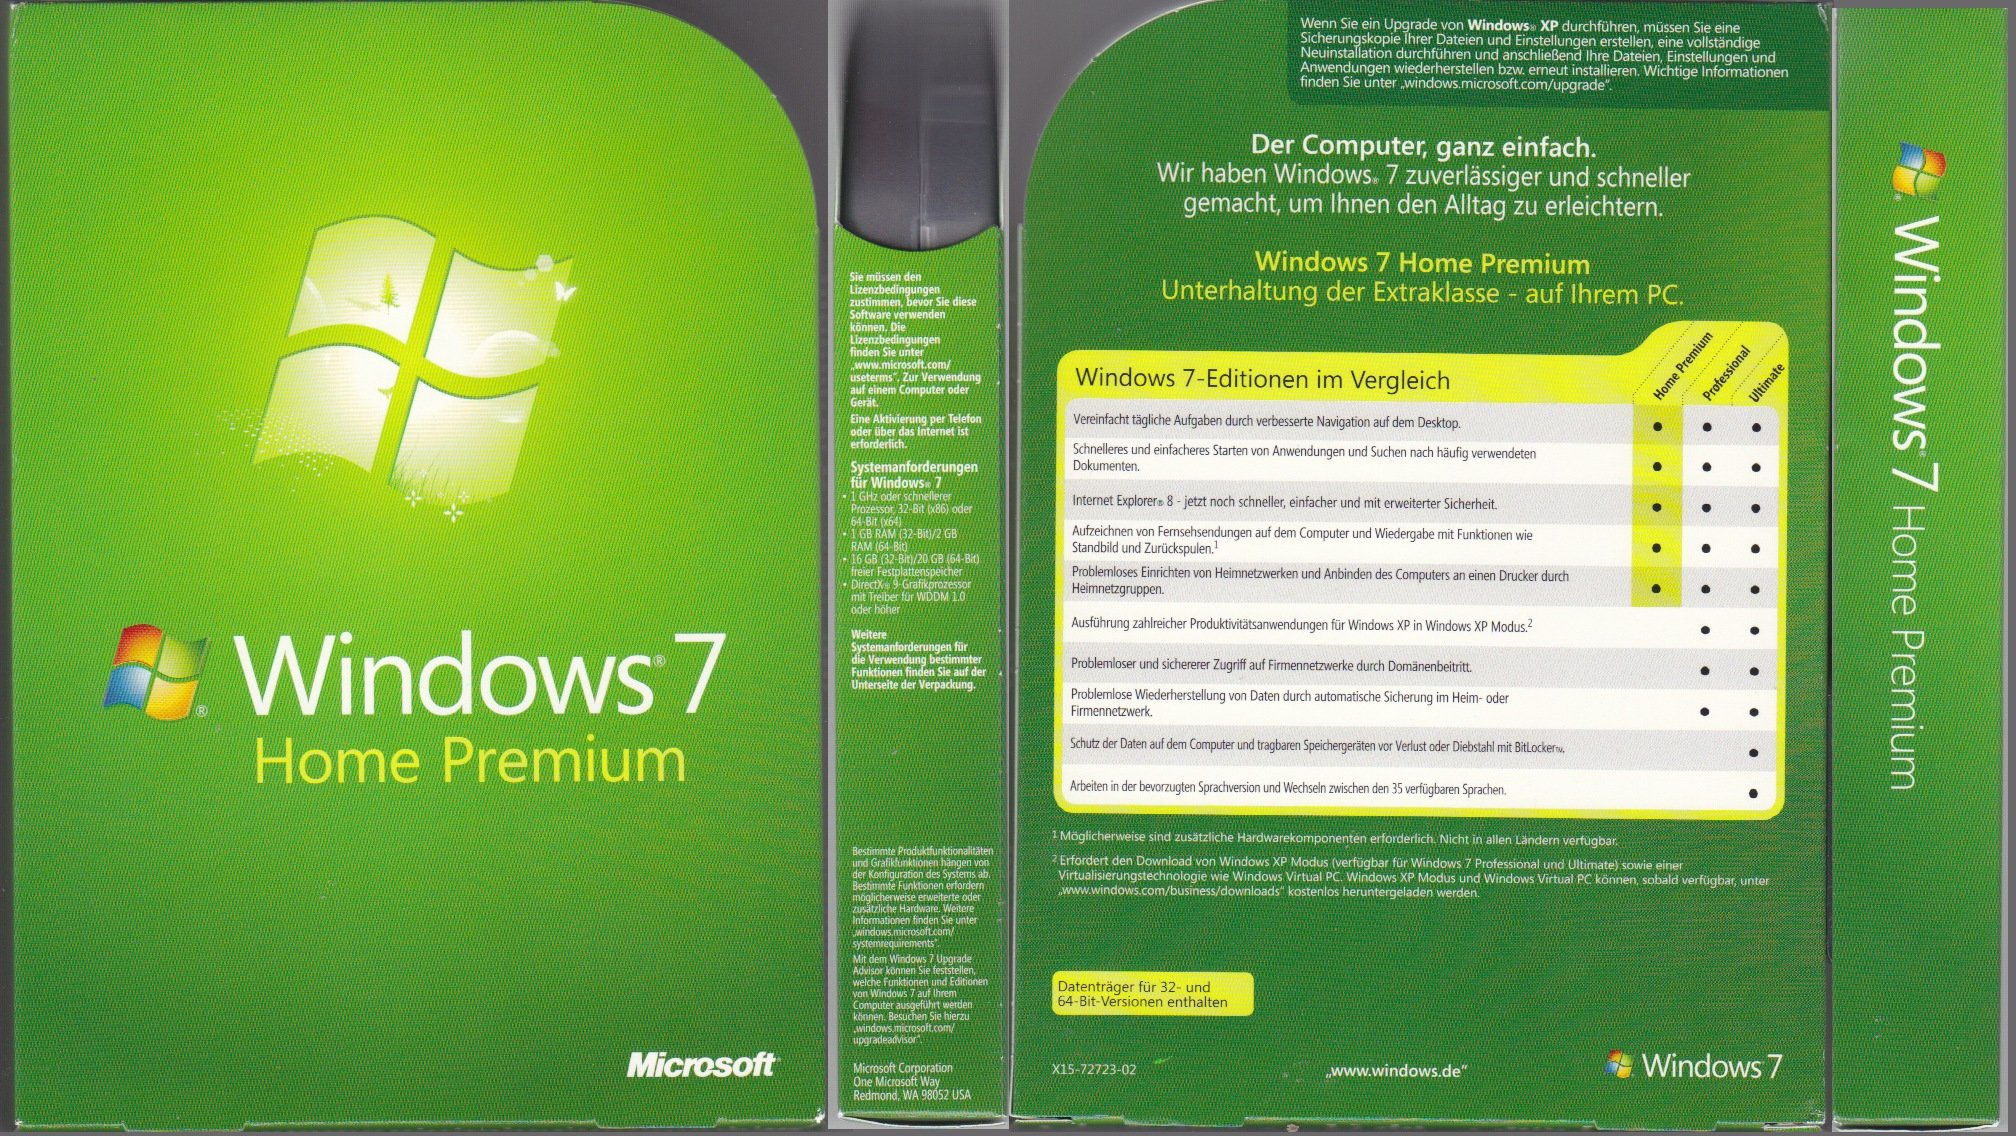 directx 10 free download for windows xp 32 bit full